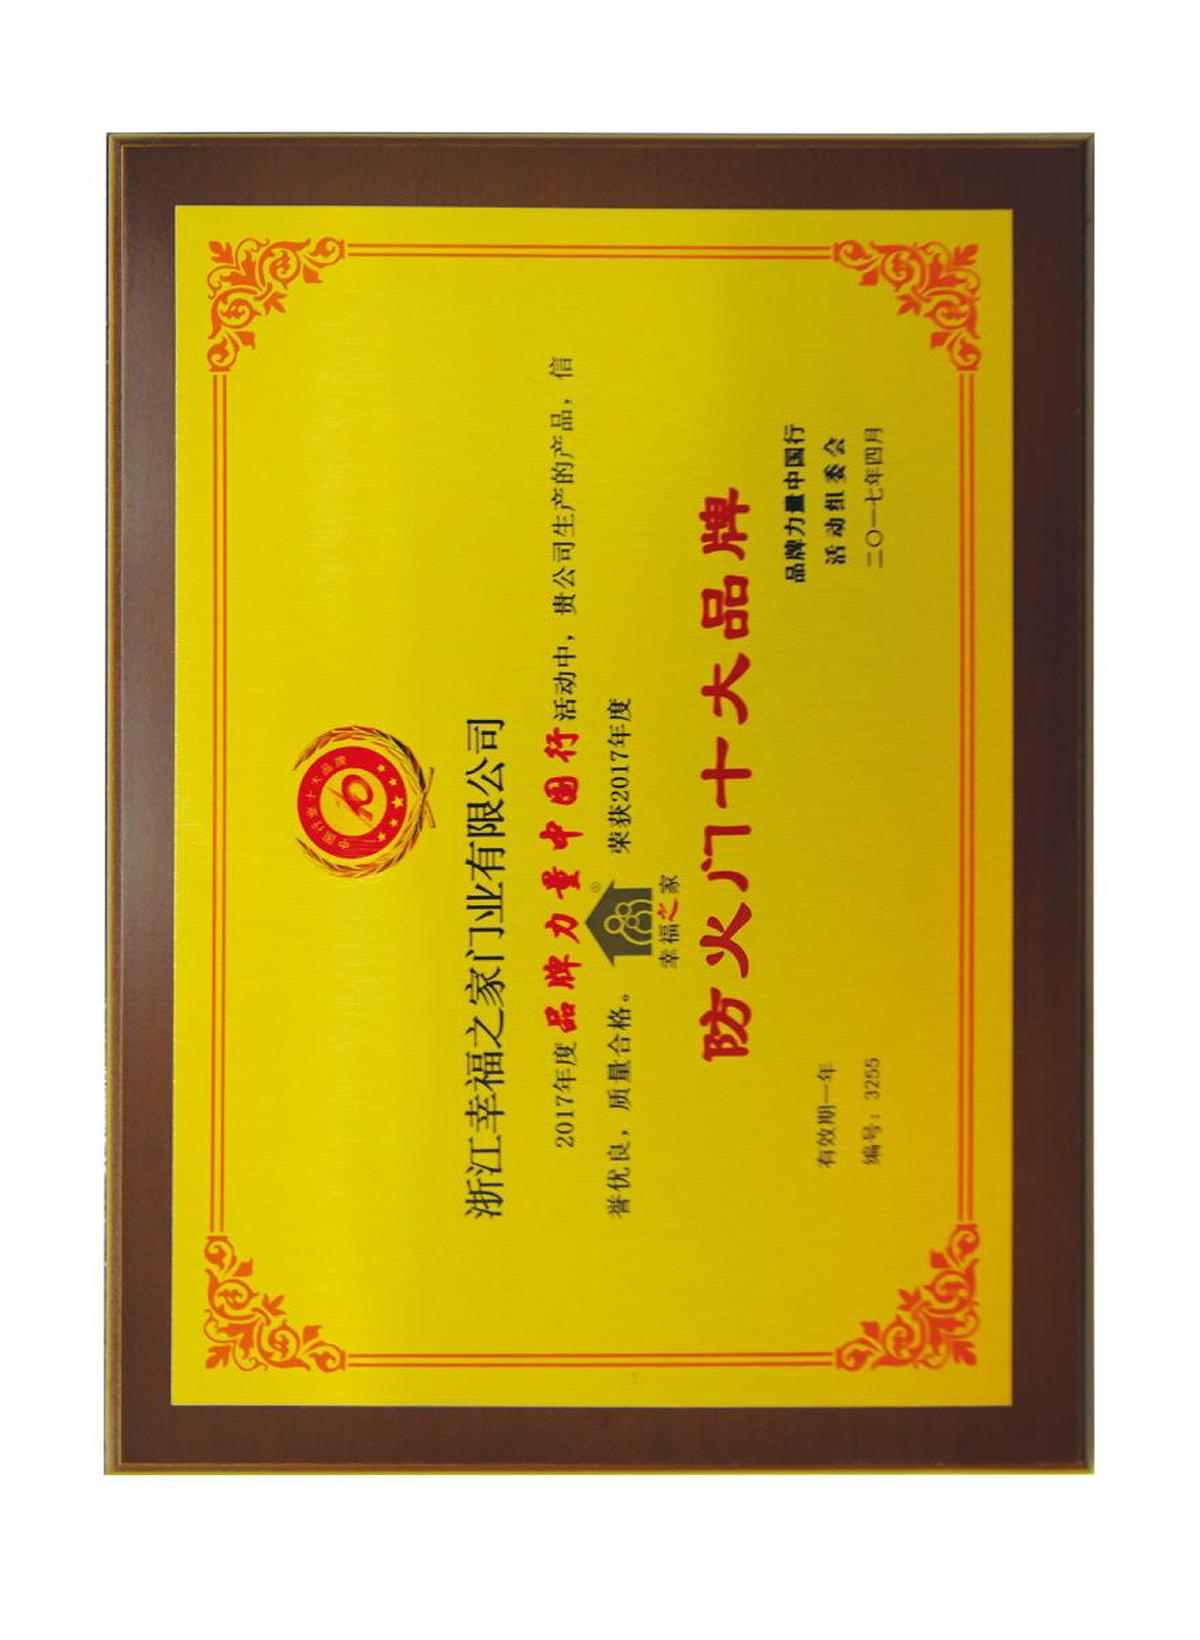 10-中��防火�T行�I十大品牌.png